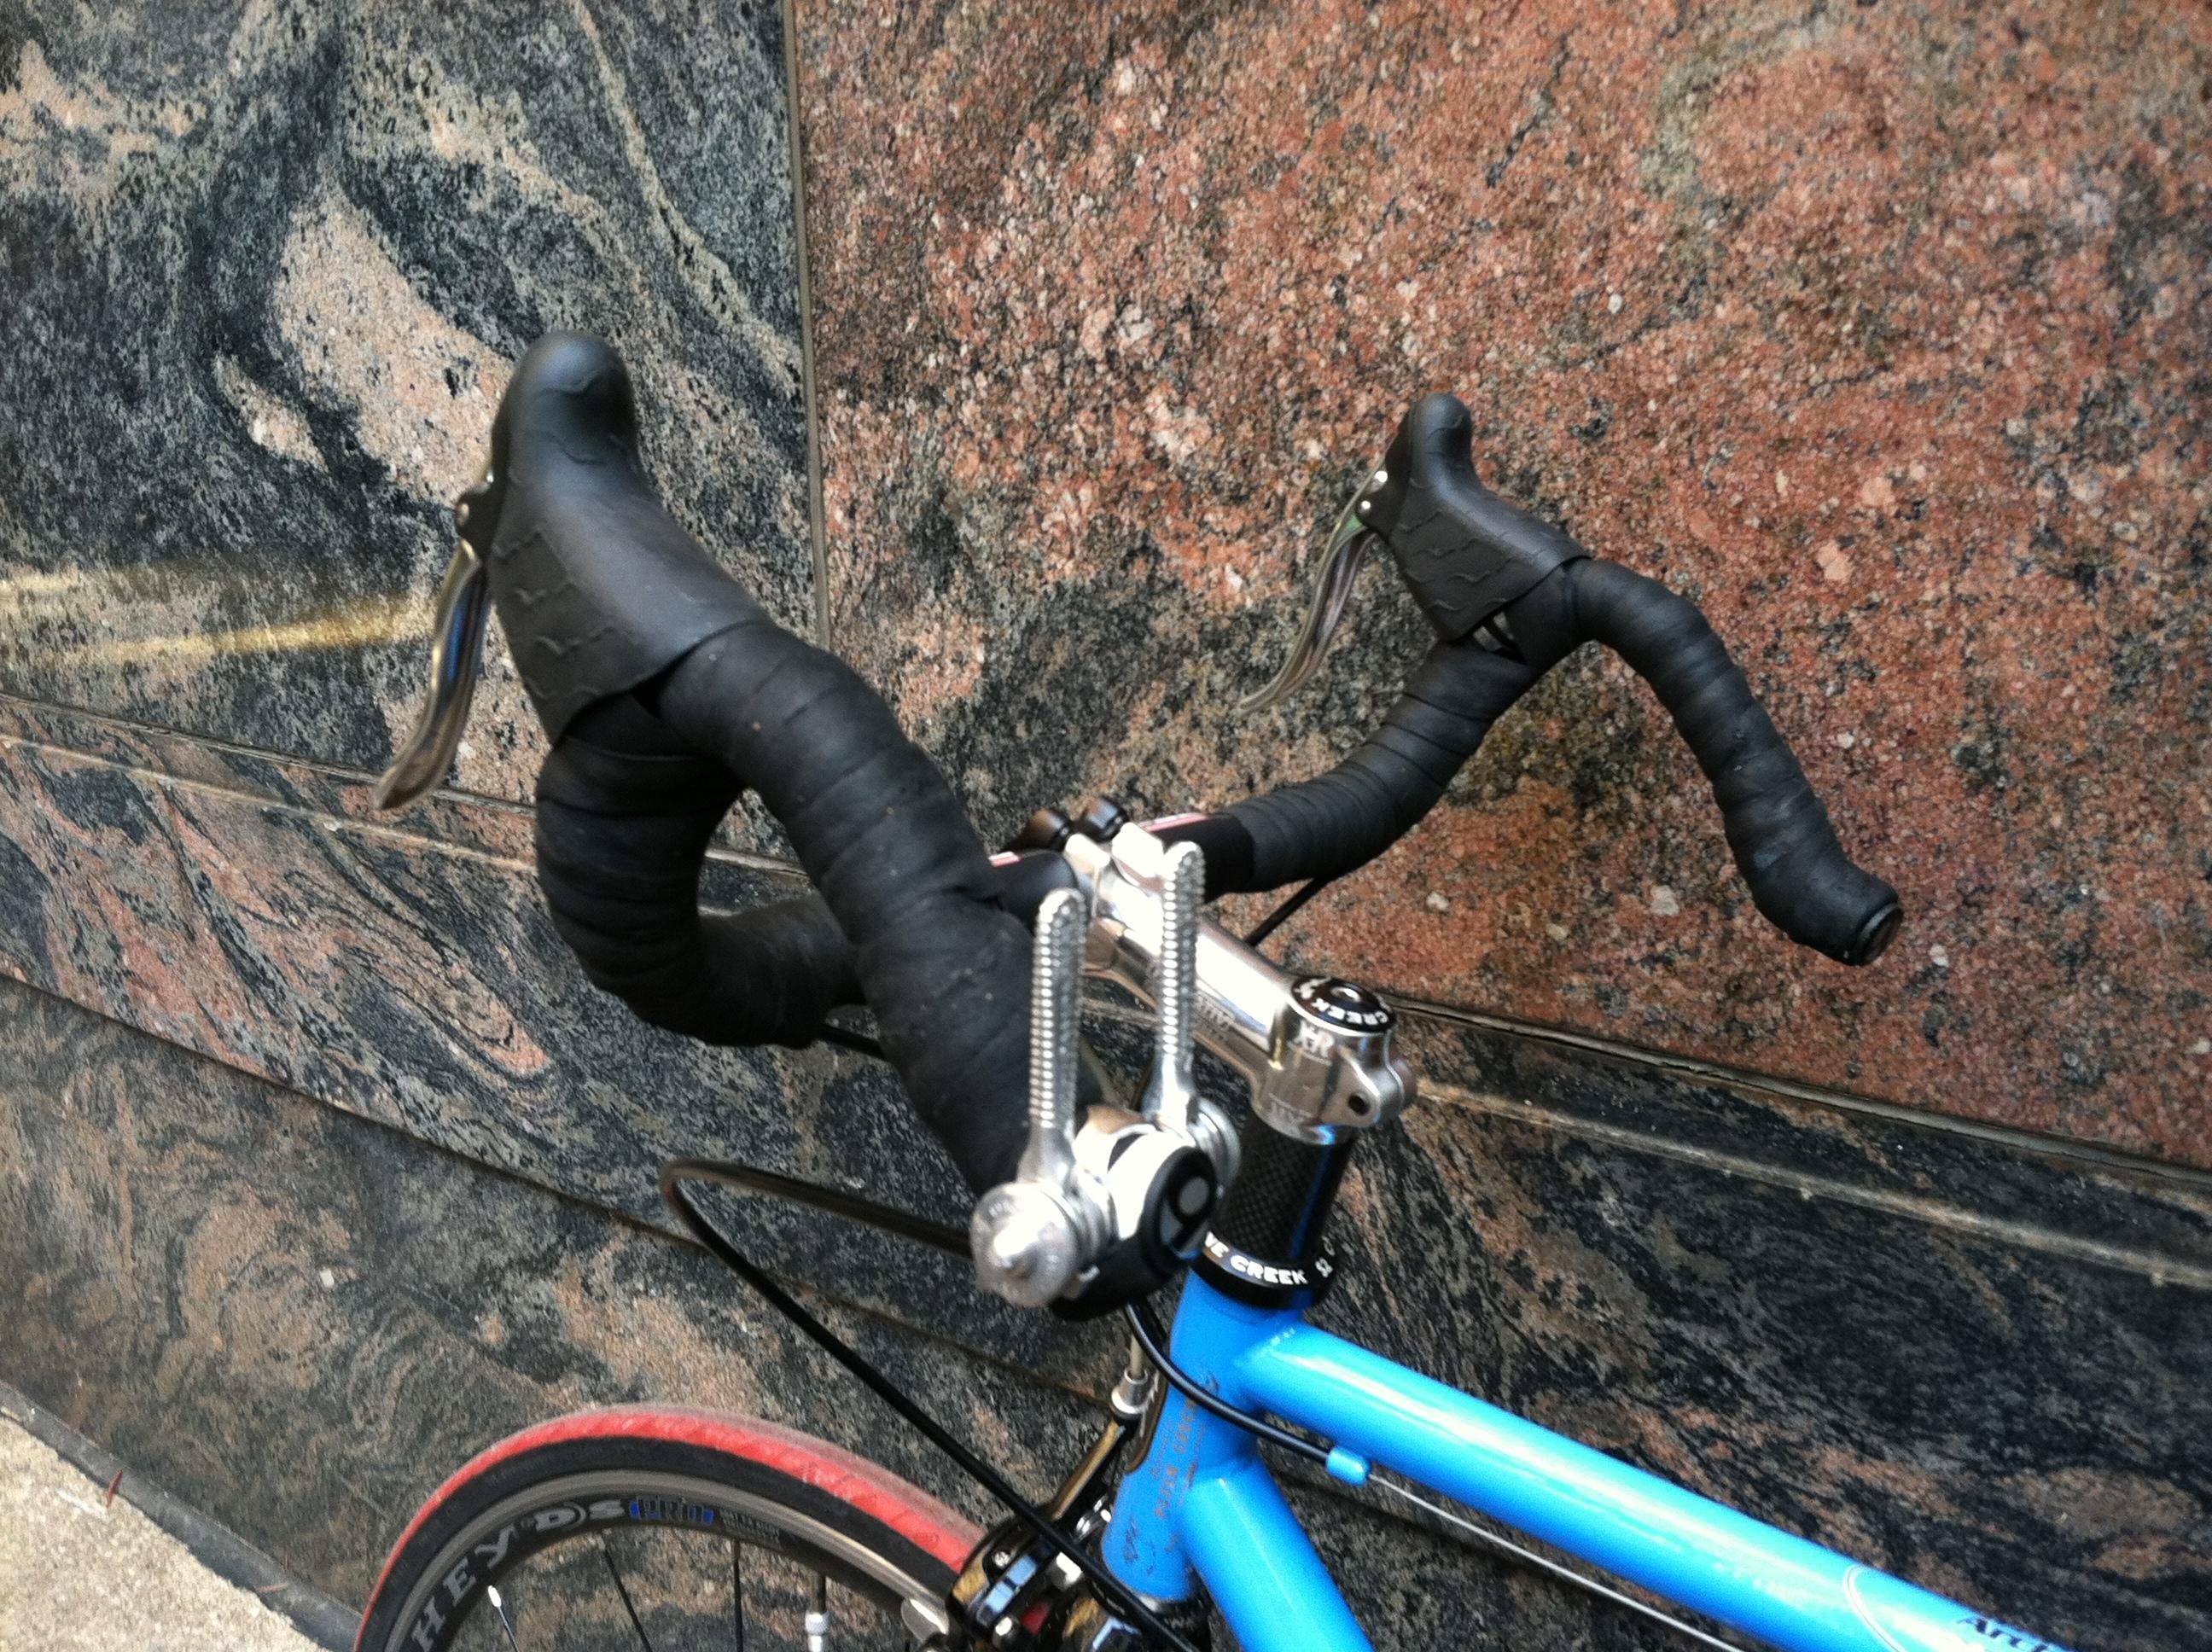 Bikes Handlebar Brake Facts Hooded brake levers and Campy